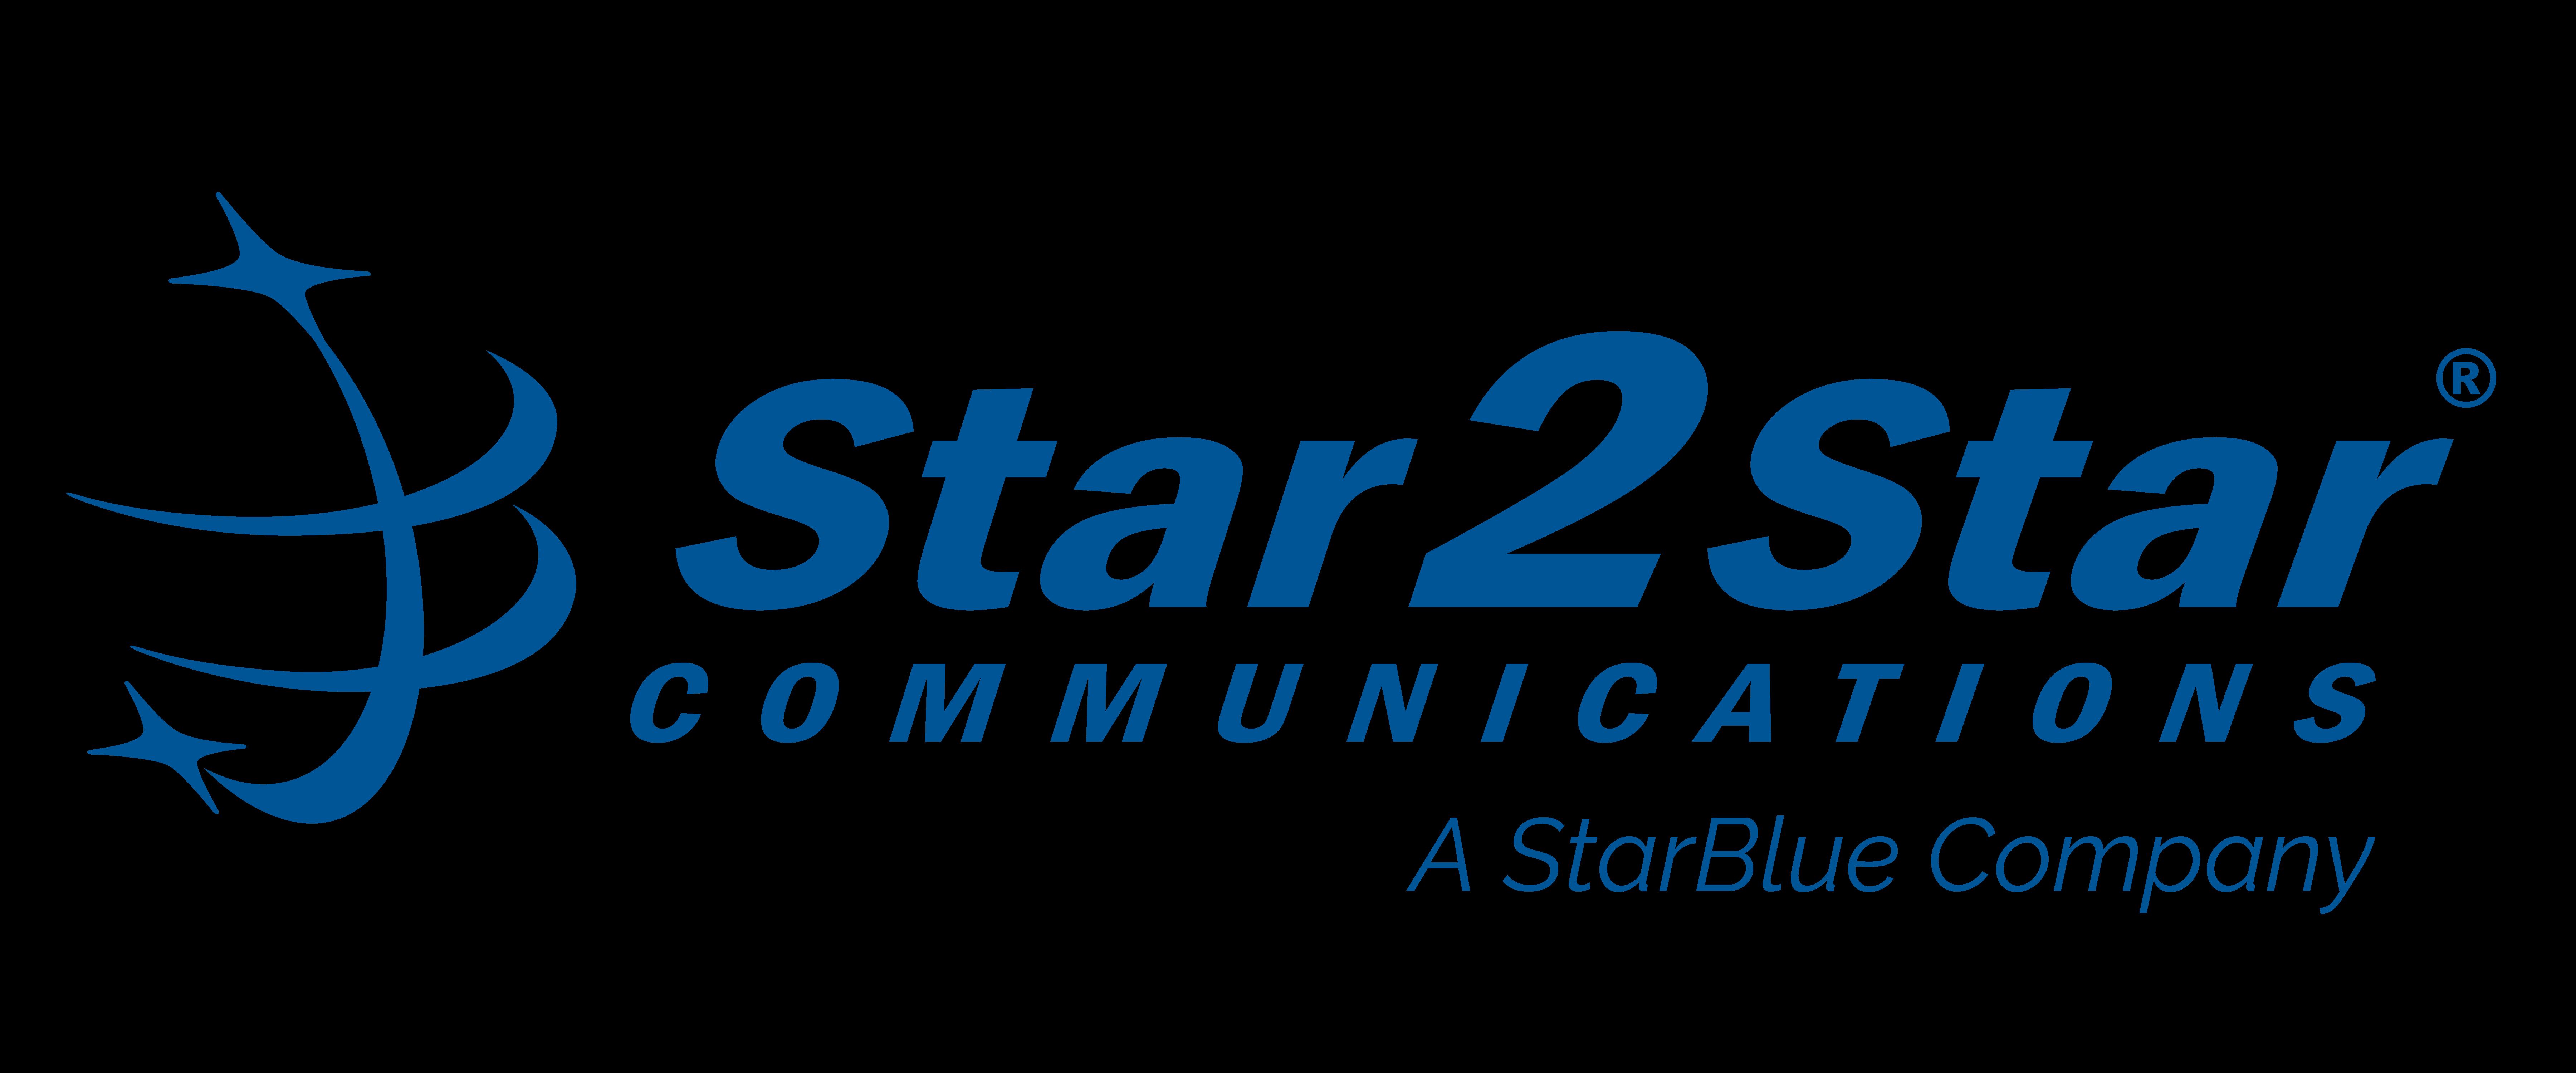 Star 2 Star logo